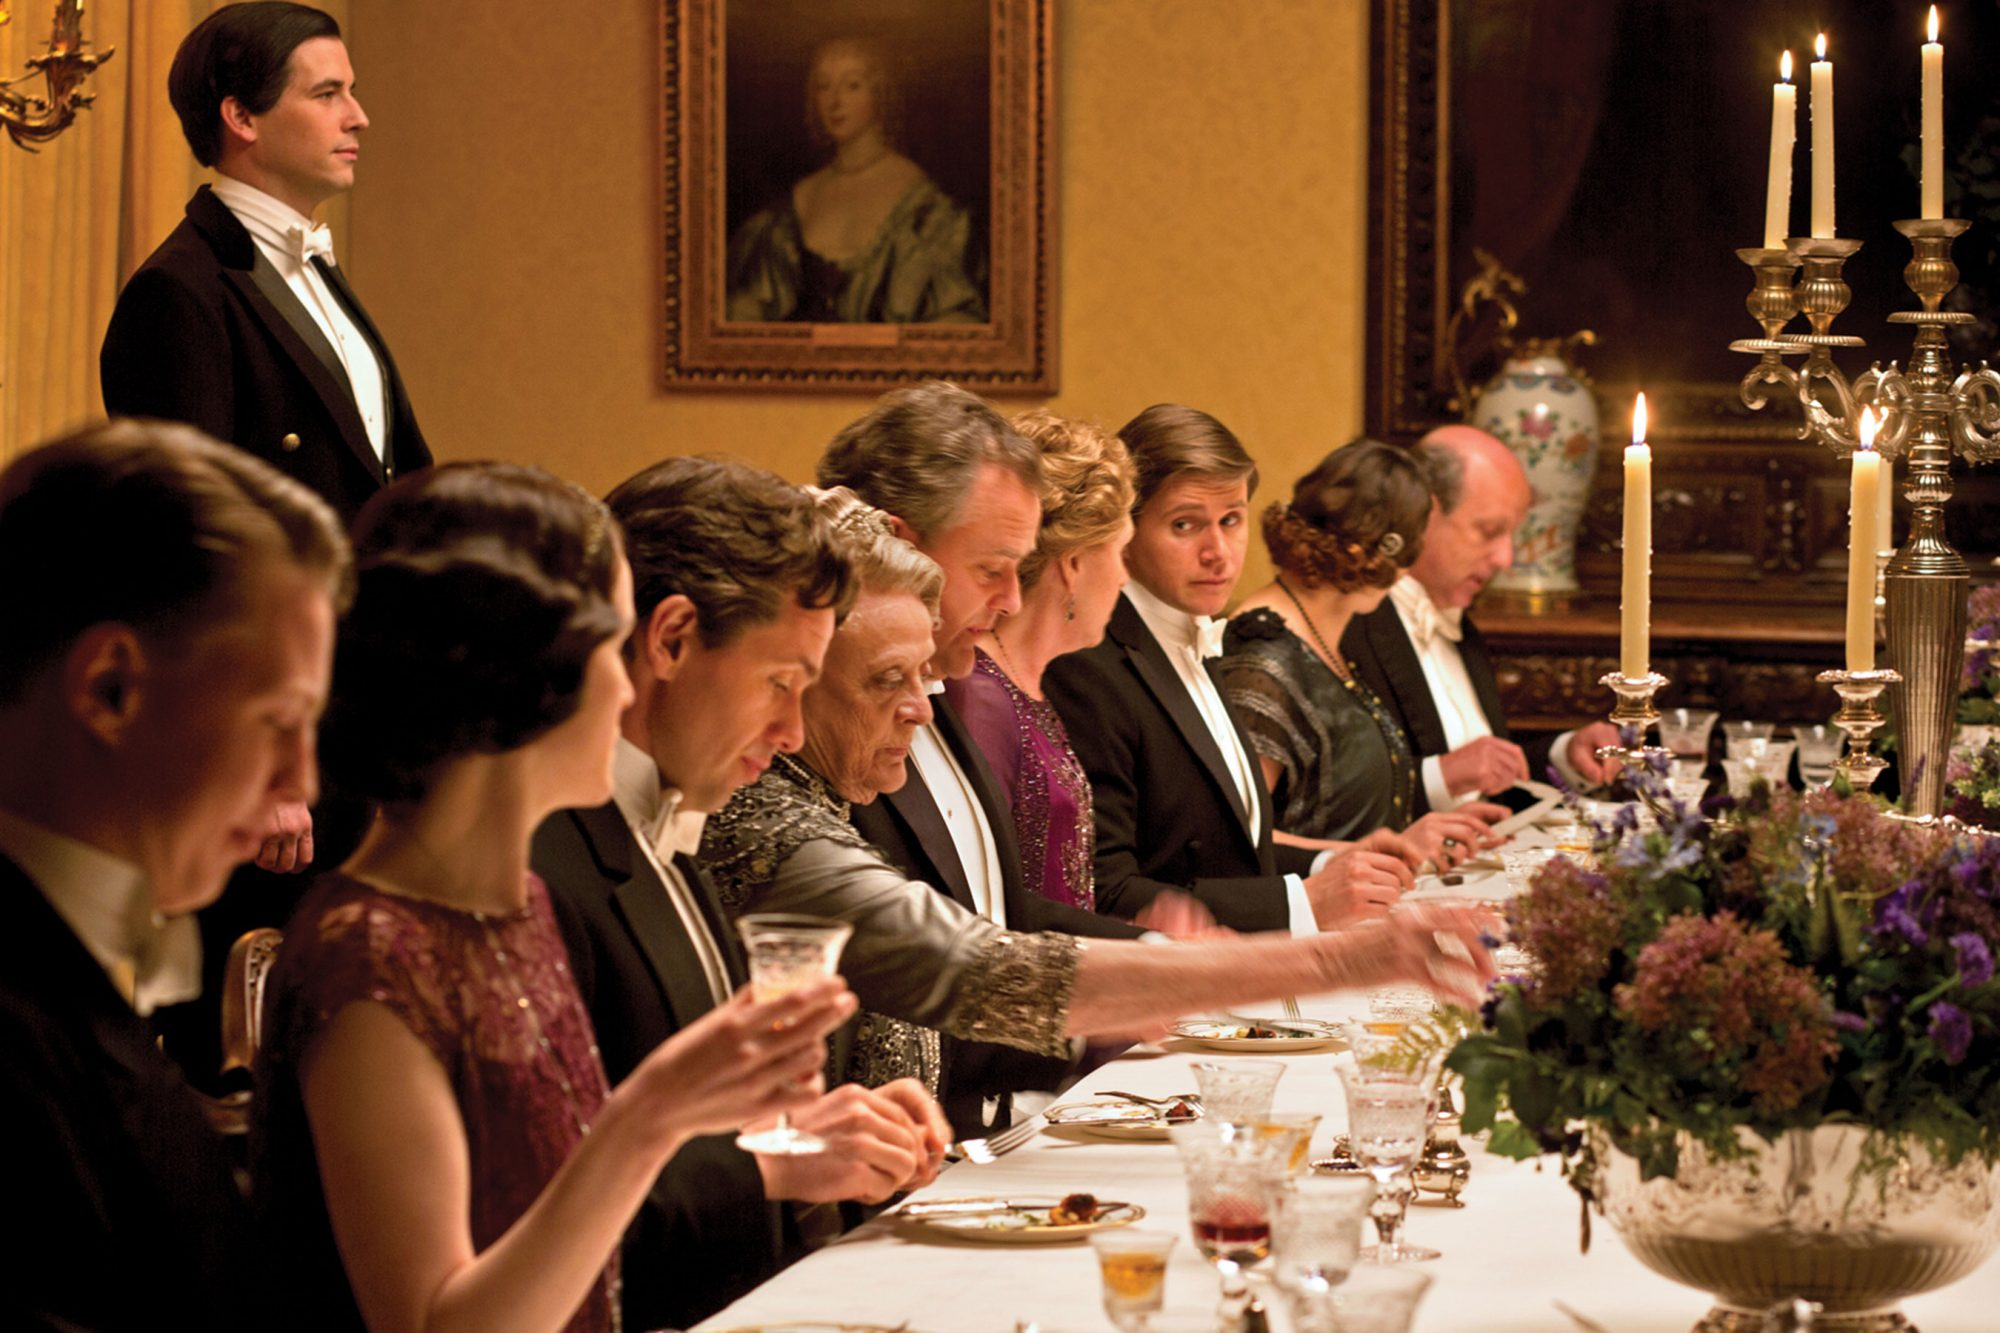 Downton AbbeyMASTERPIECE Classic Photo credit: PBS